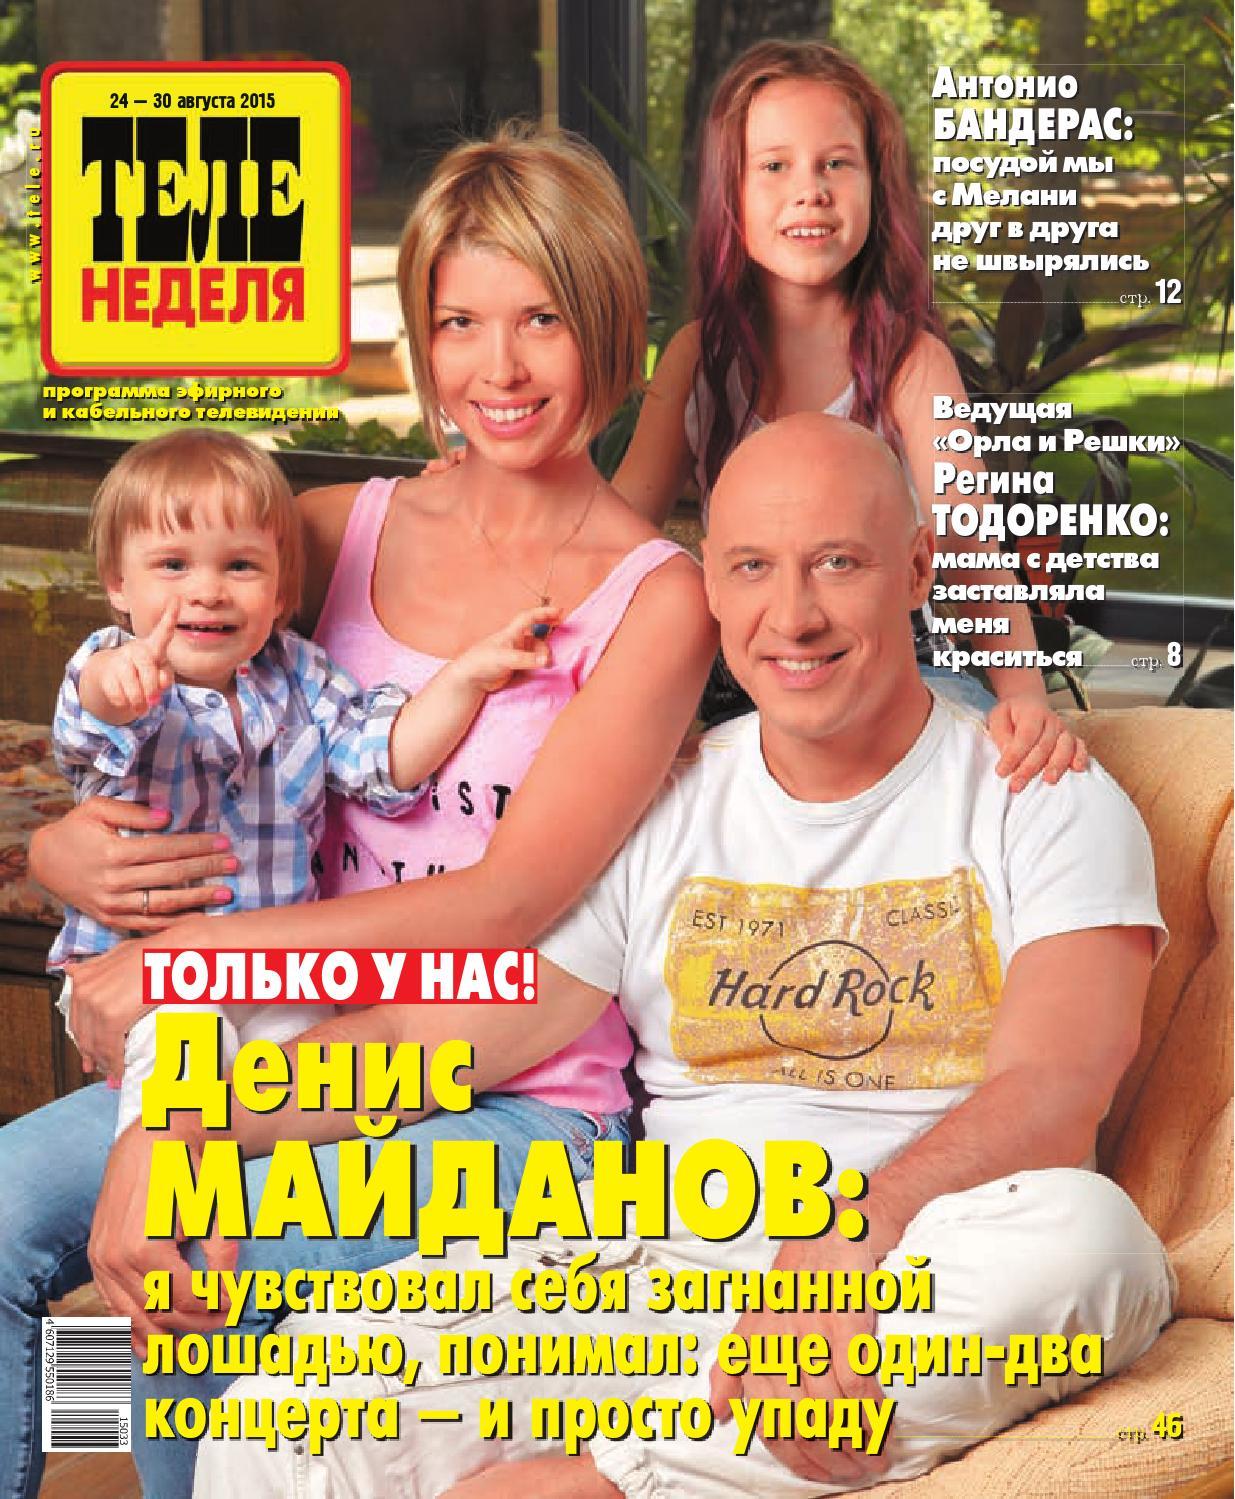 Мору Тирни Имеют Сзади – Сериал Любовники (2014)